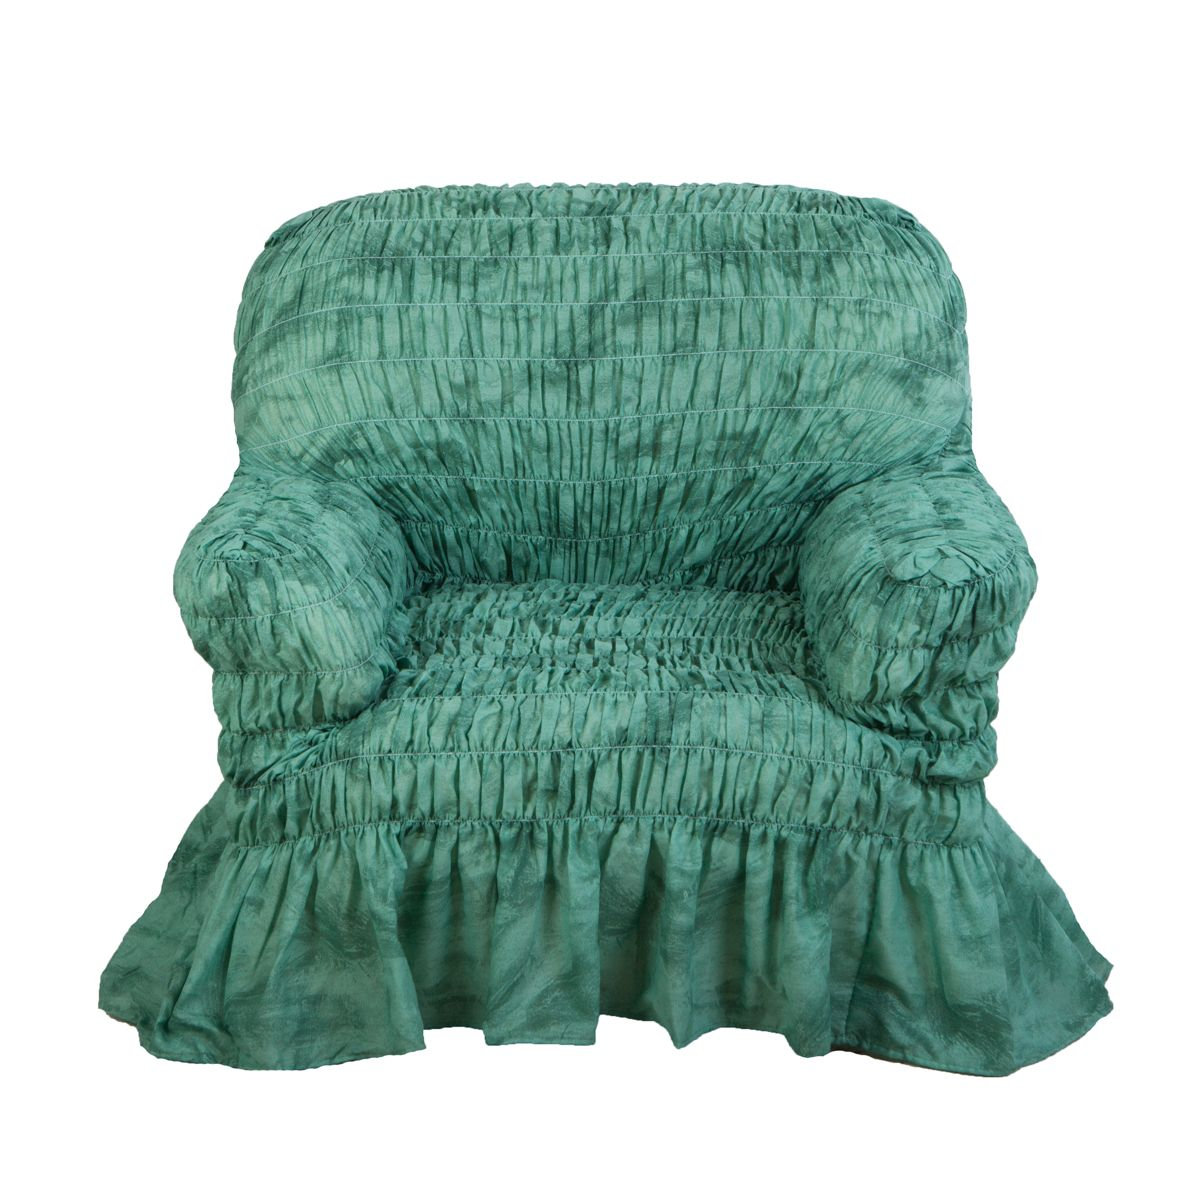 Фантазия Зеленый. Чехол на креслоФантазия<br><br>